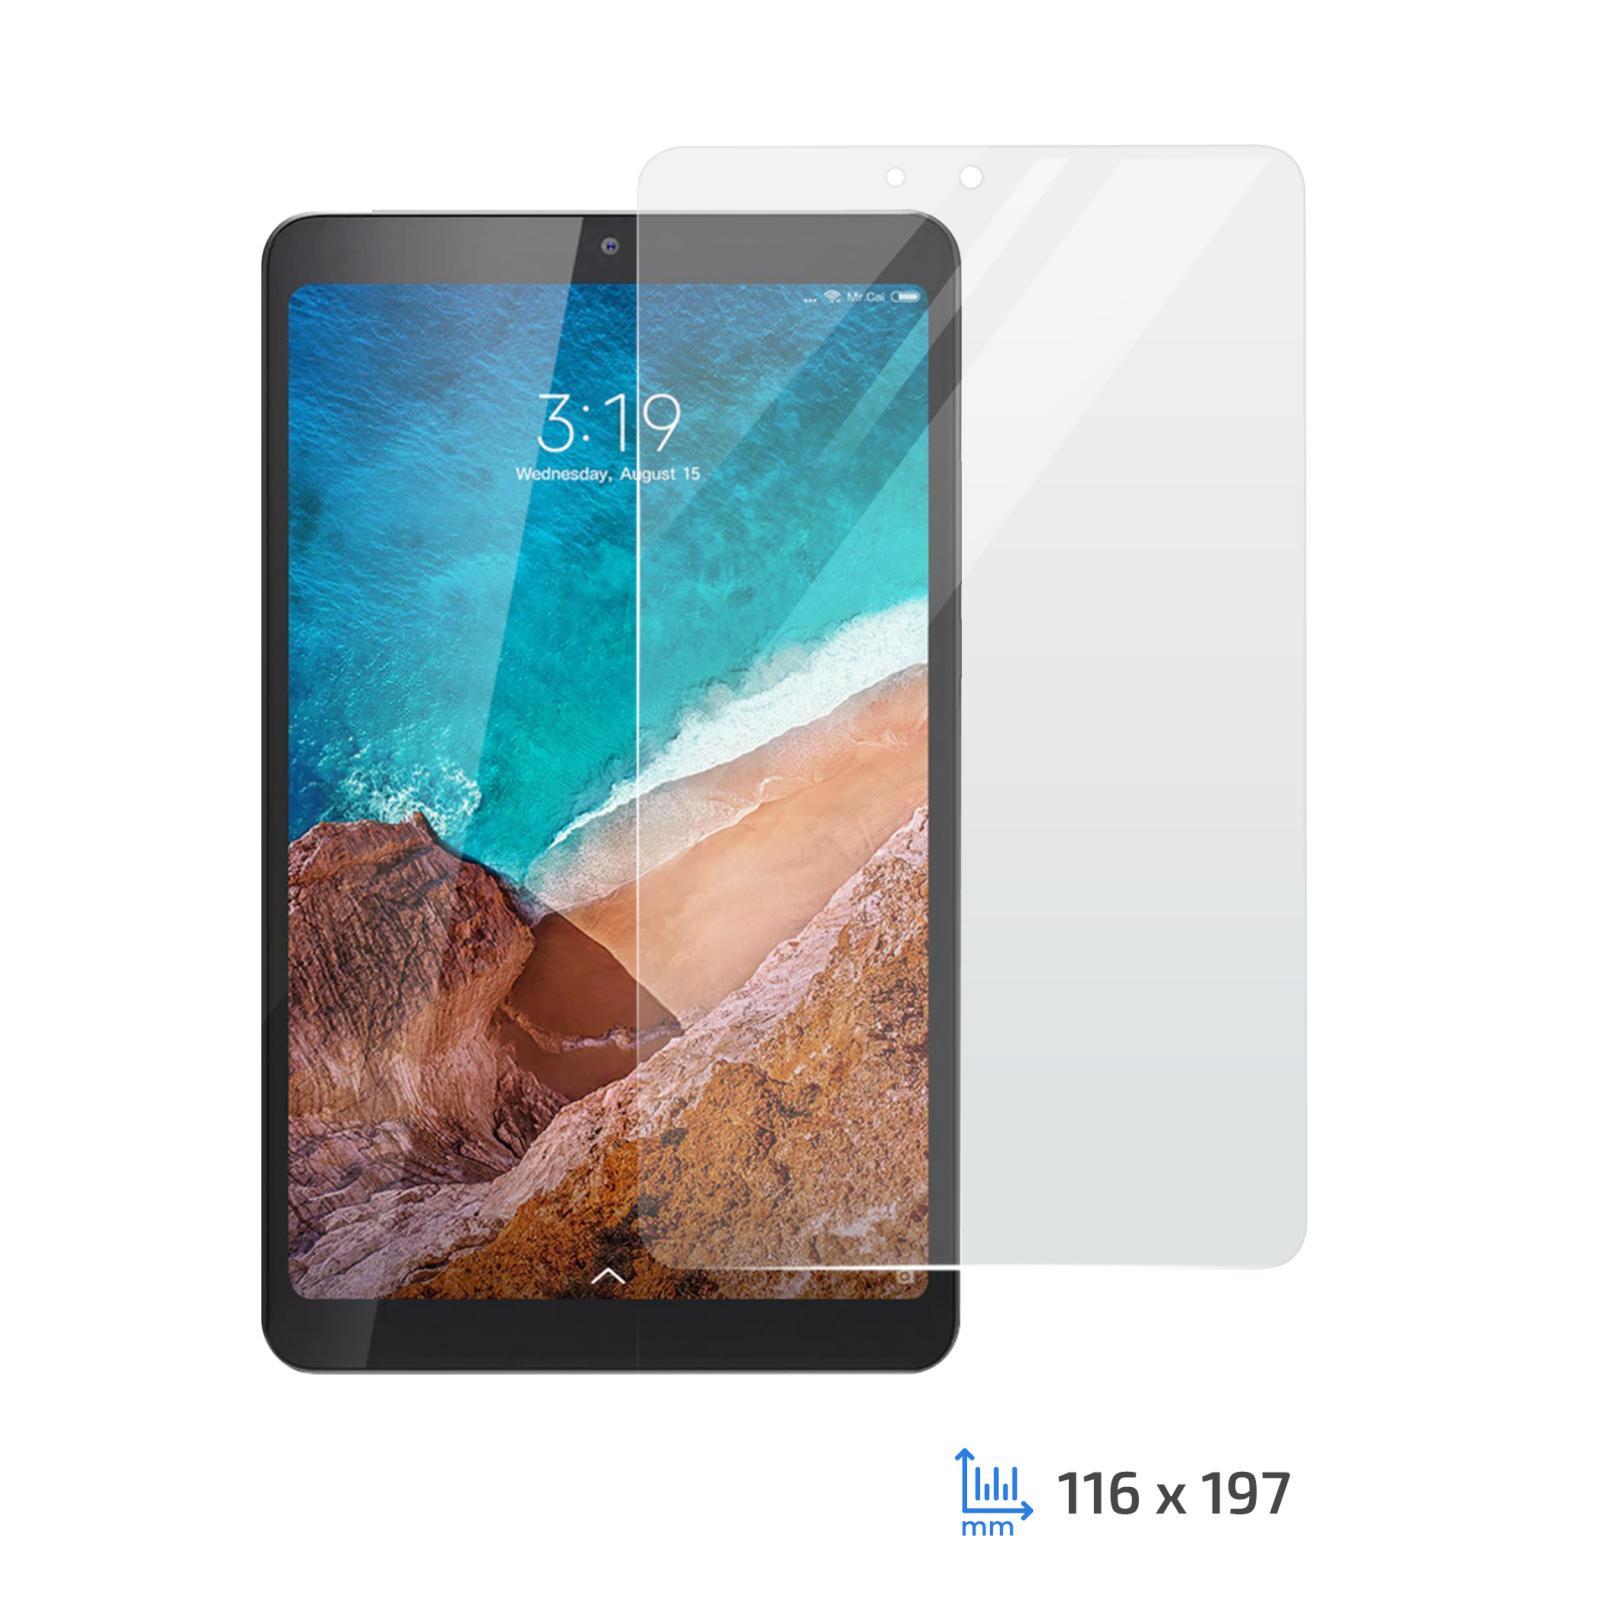 Стекло защитное 2E Xiaomi Mi Pad 4 WiFi / LTE, 2.5D, Clear (2E-MI-PAD4-LT25D-CL)